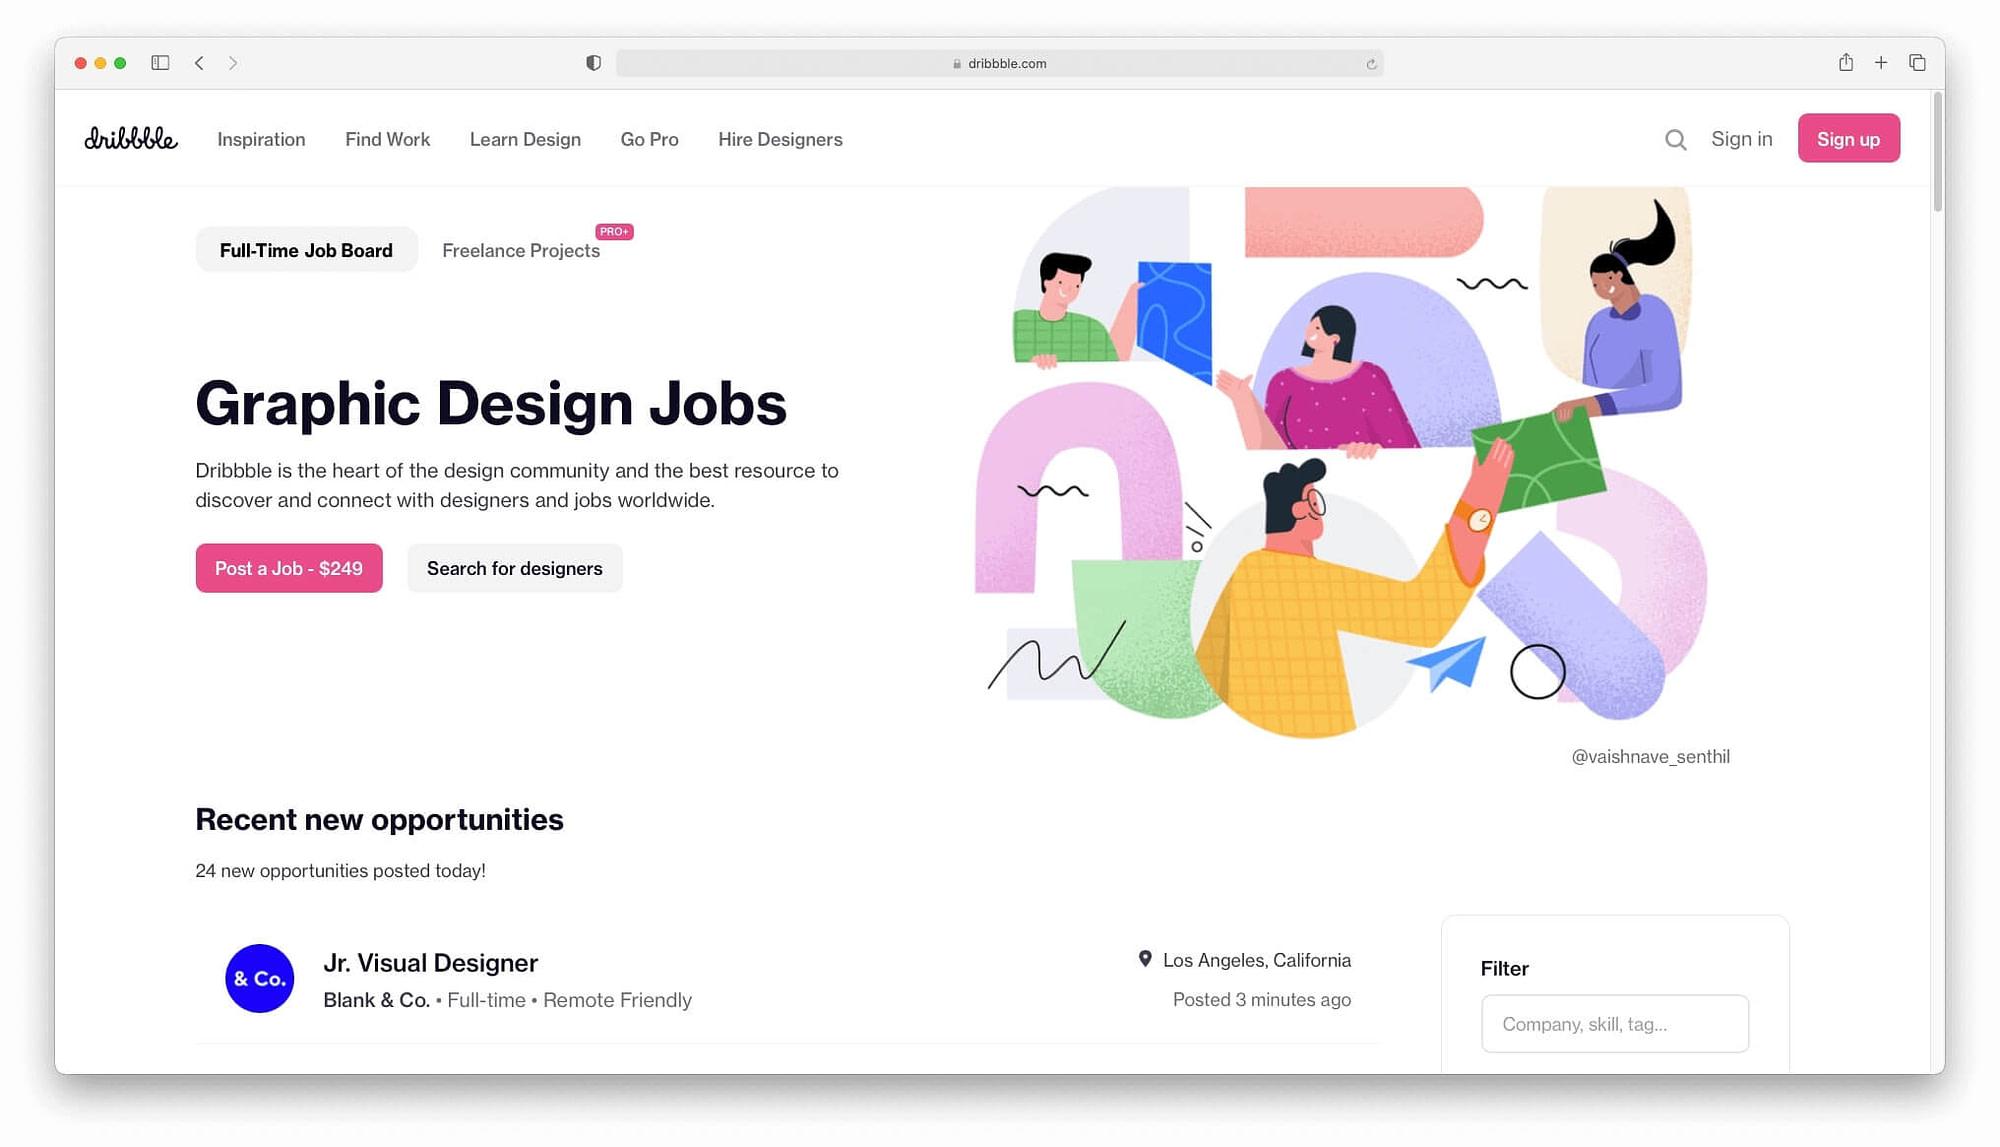 Dribble has a job platform for designers